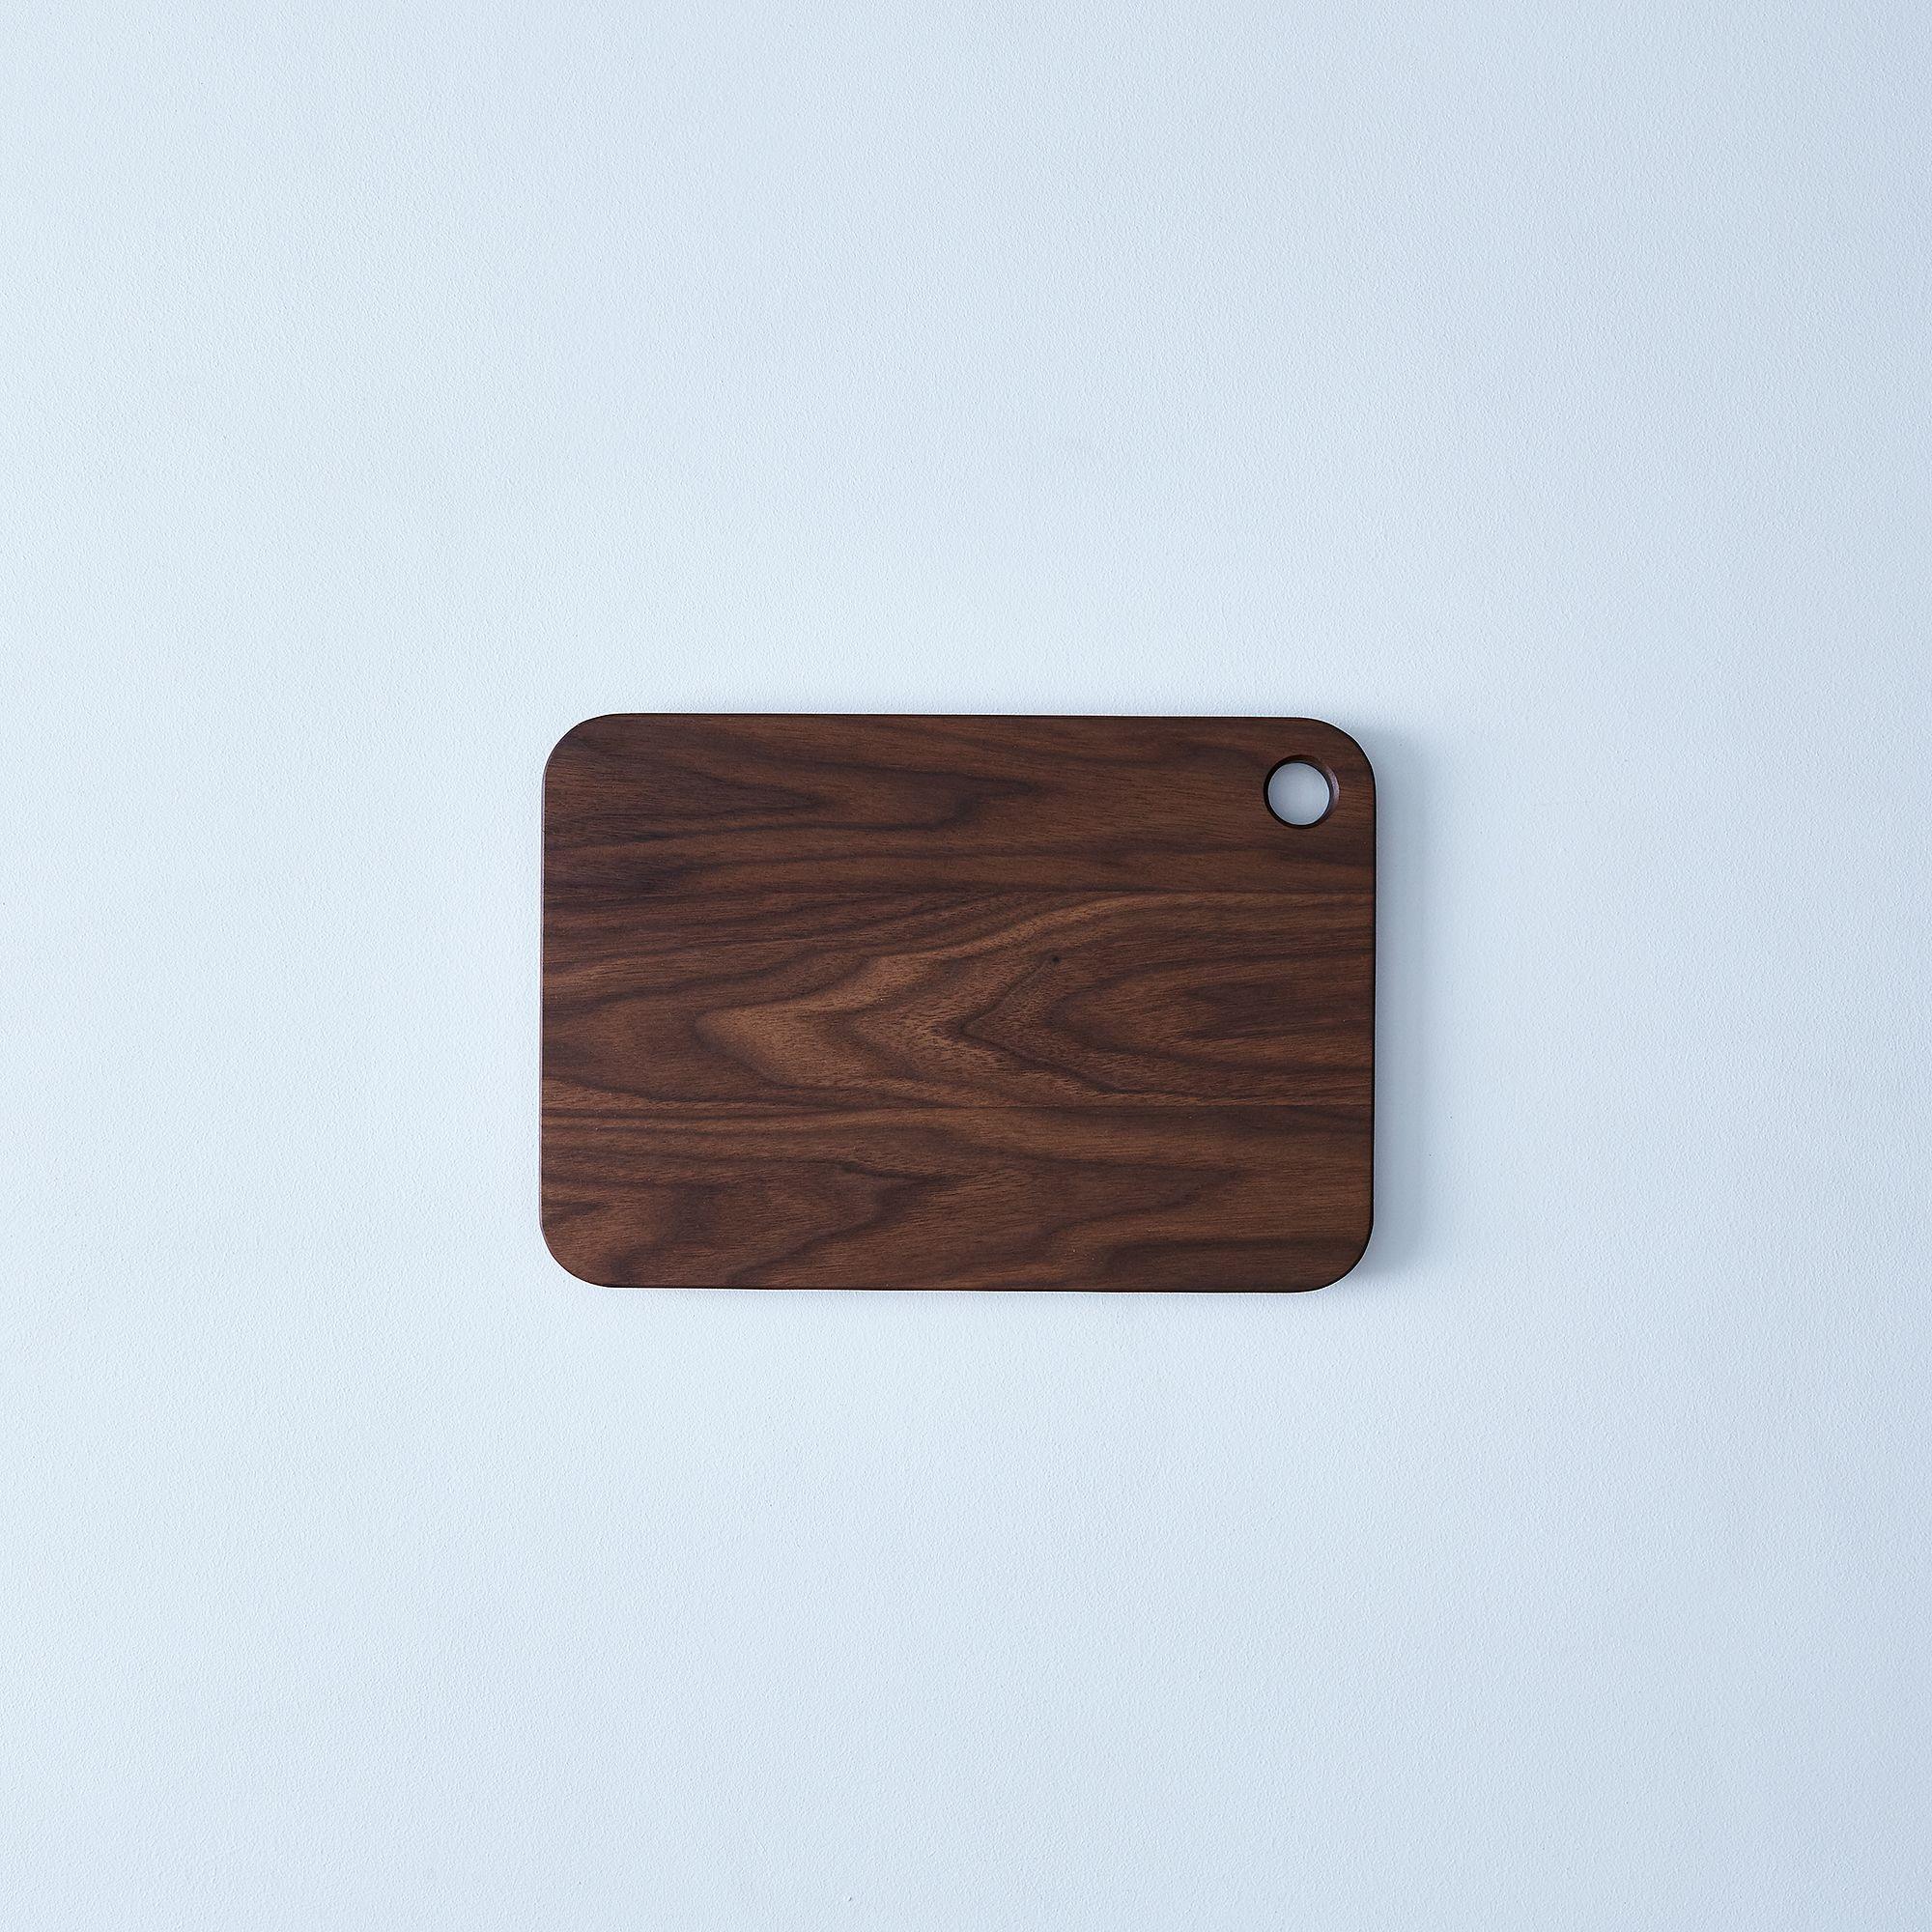 587728de 7197 4bcb b9e5 012c797c432b  2017 0413 magnus design walnut cutting board medium silo rocky luten 12105